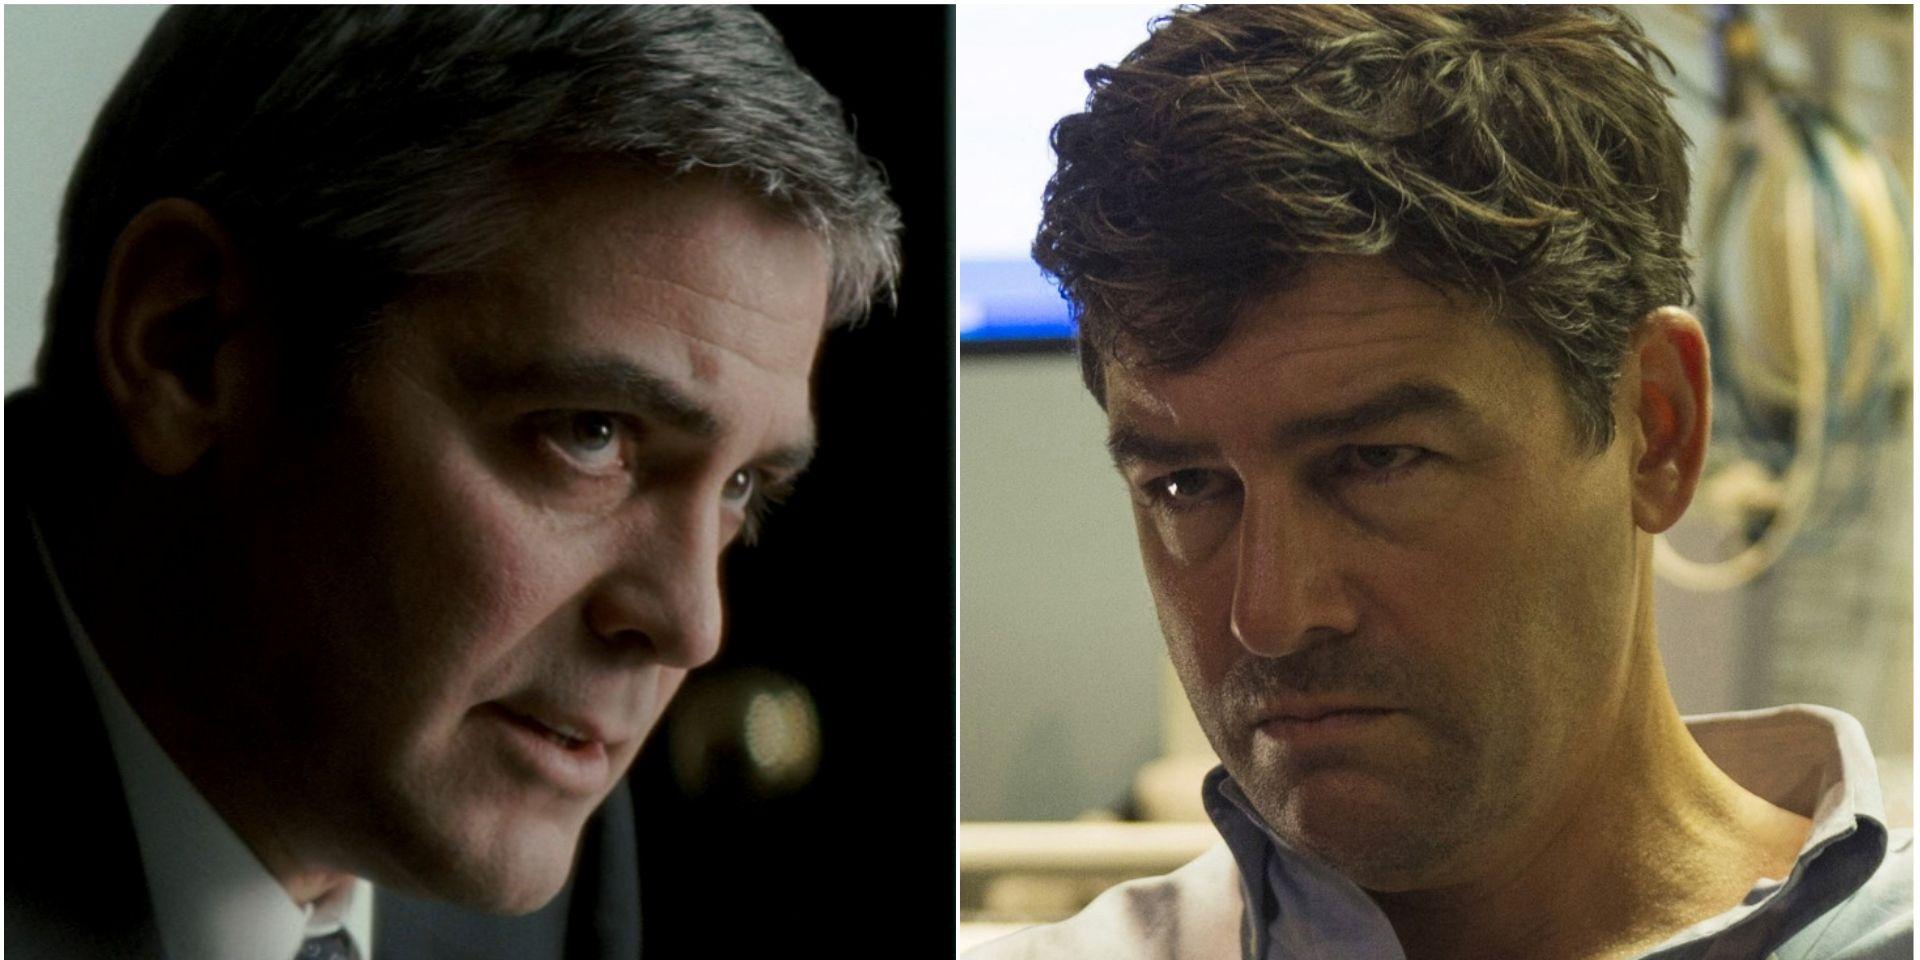 Geoge Clooney and Kyle Chandler